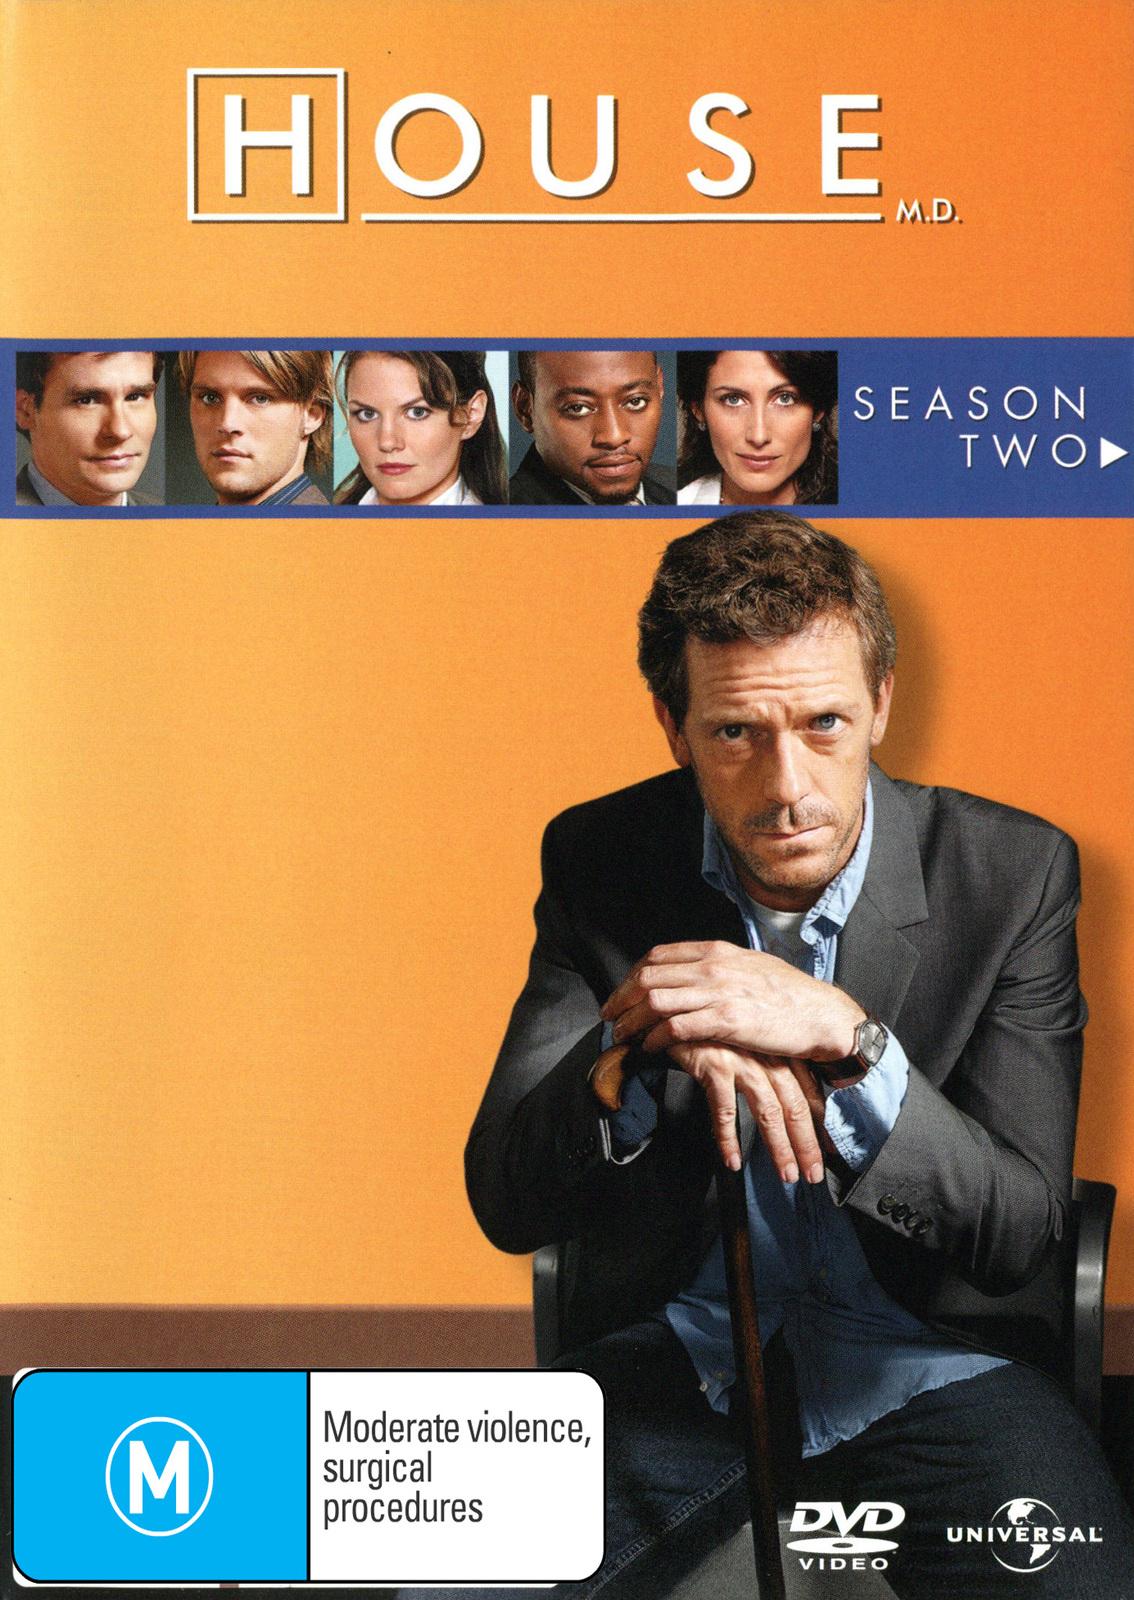 House, M.D. - Season 2 (6 Disc Slimline Set) on DVD image